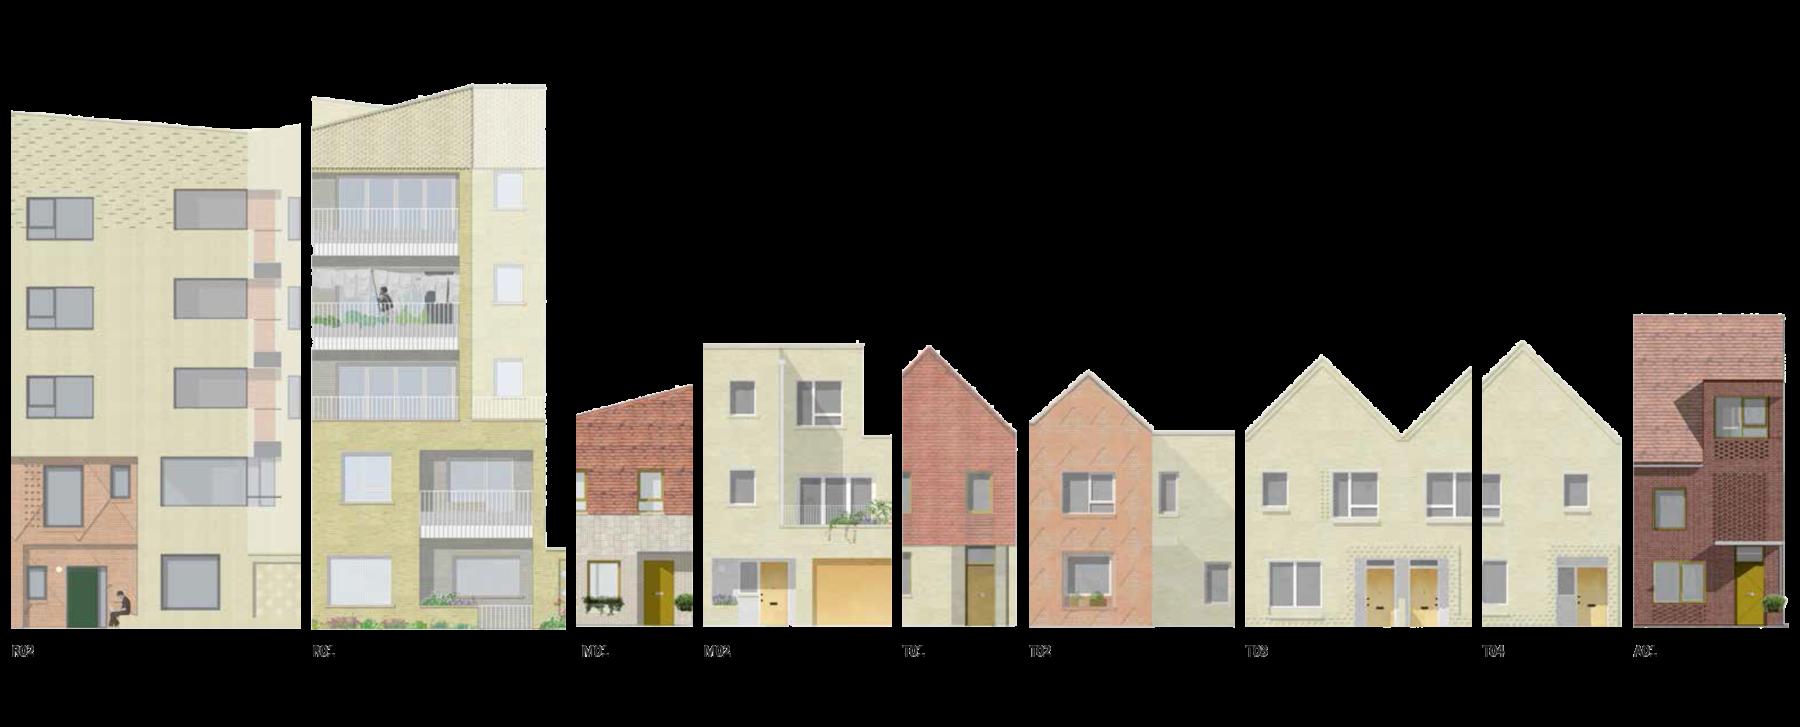 Sarah-Wigglesworth-Architects NWC elevations 3600